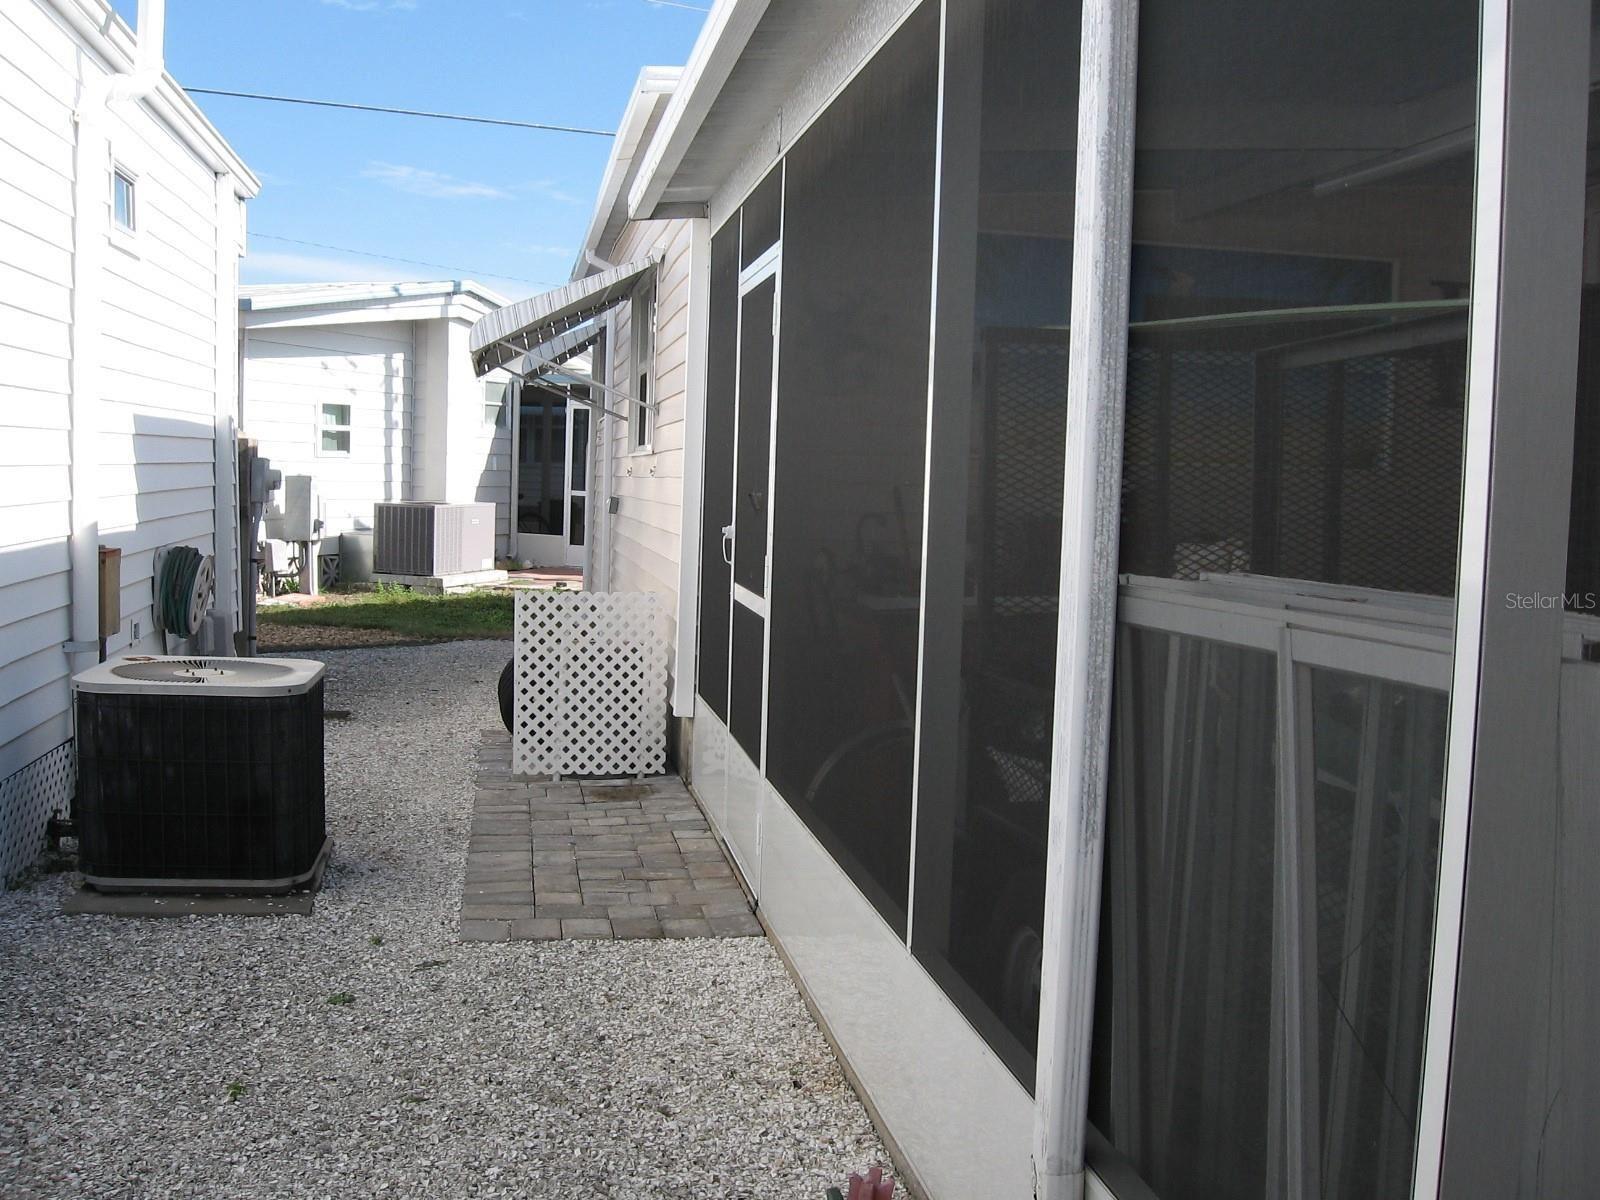 Photo of 1805 IOWA AVENUE, BRADENTON, FL 34207 (MLS # A4515274)